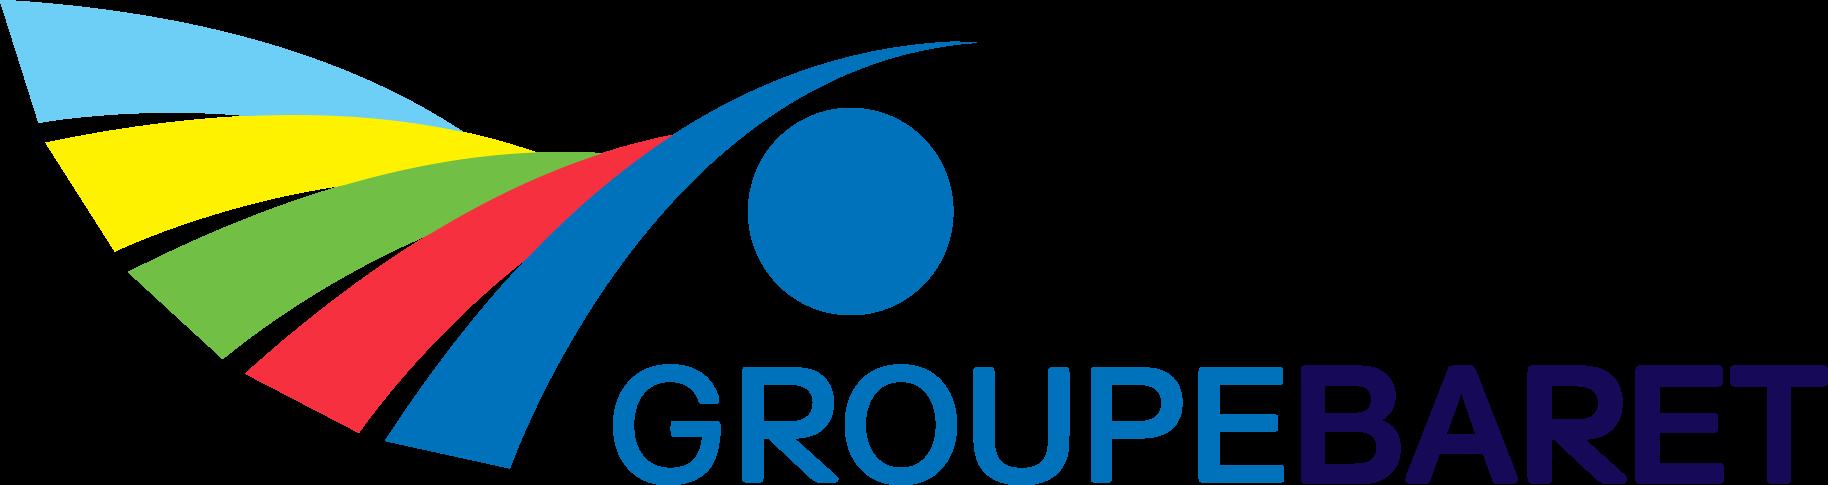 Accueil Groupe Baret